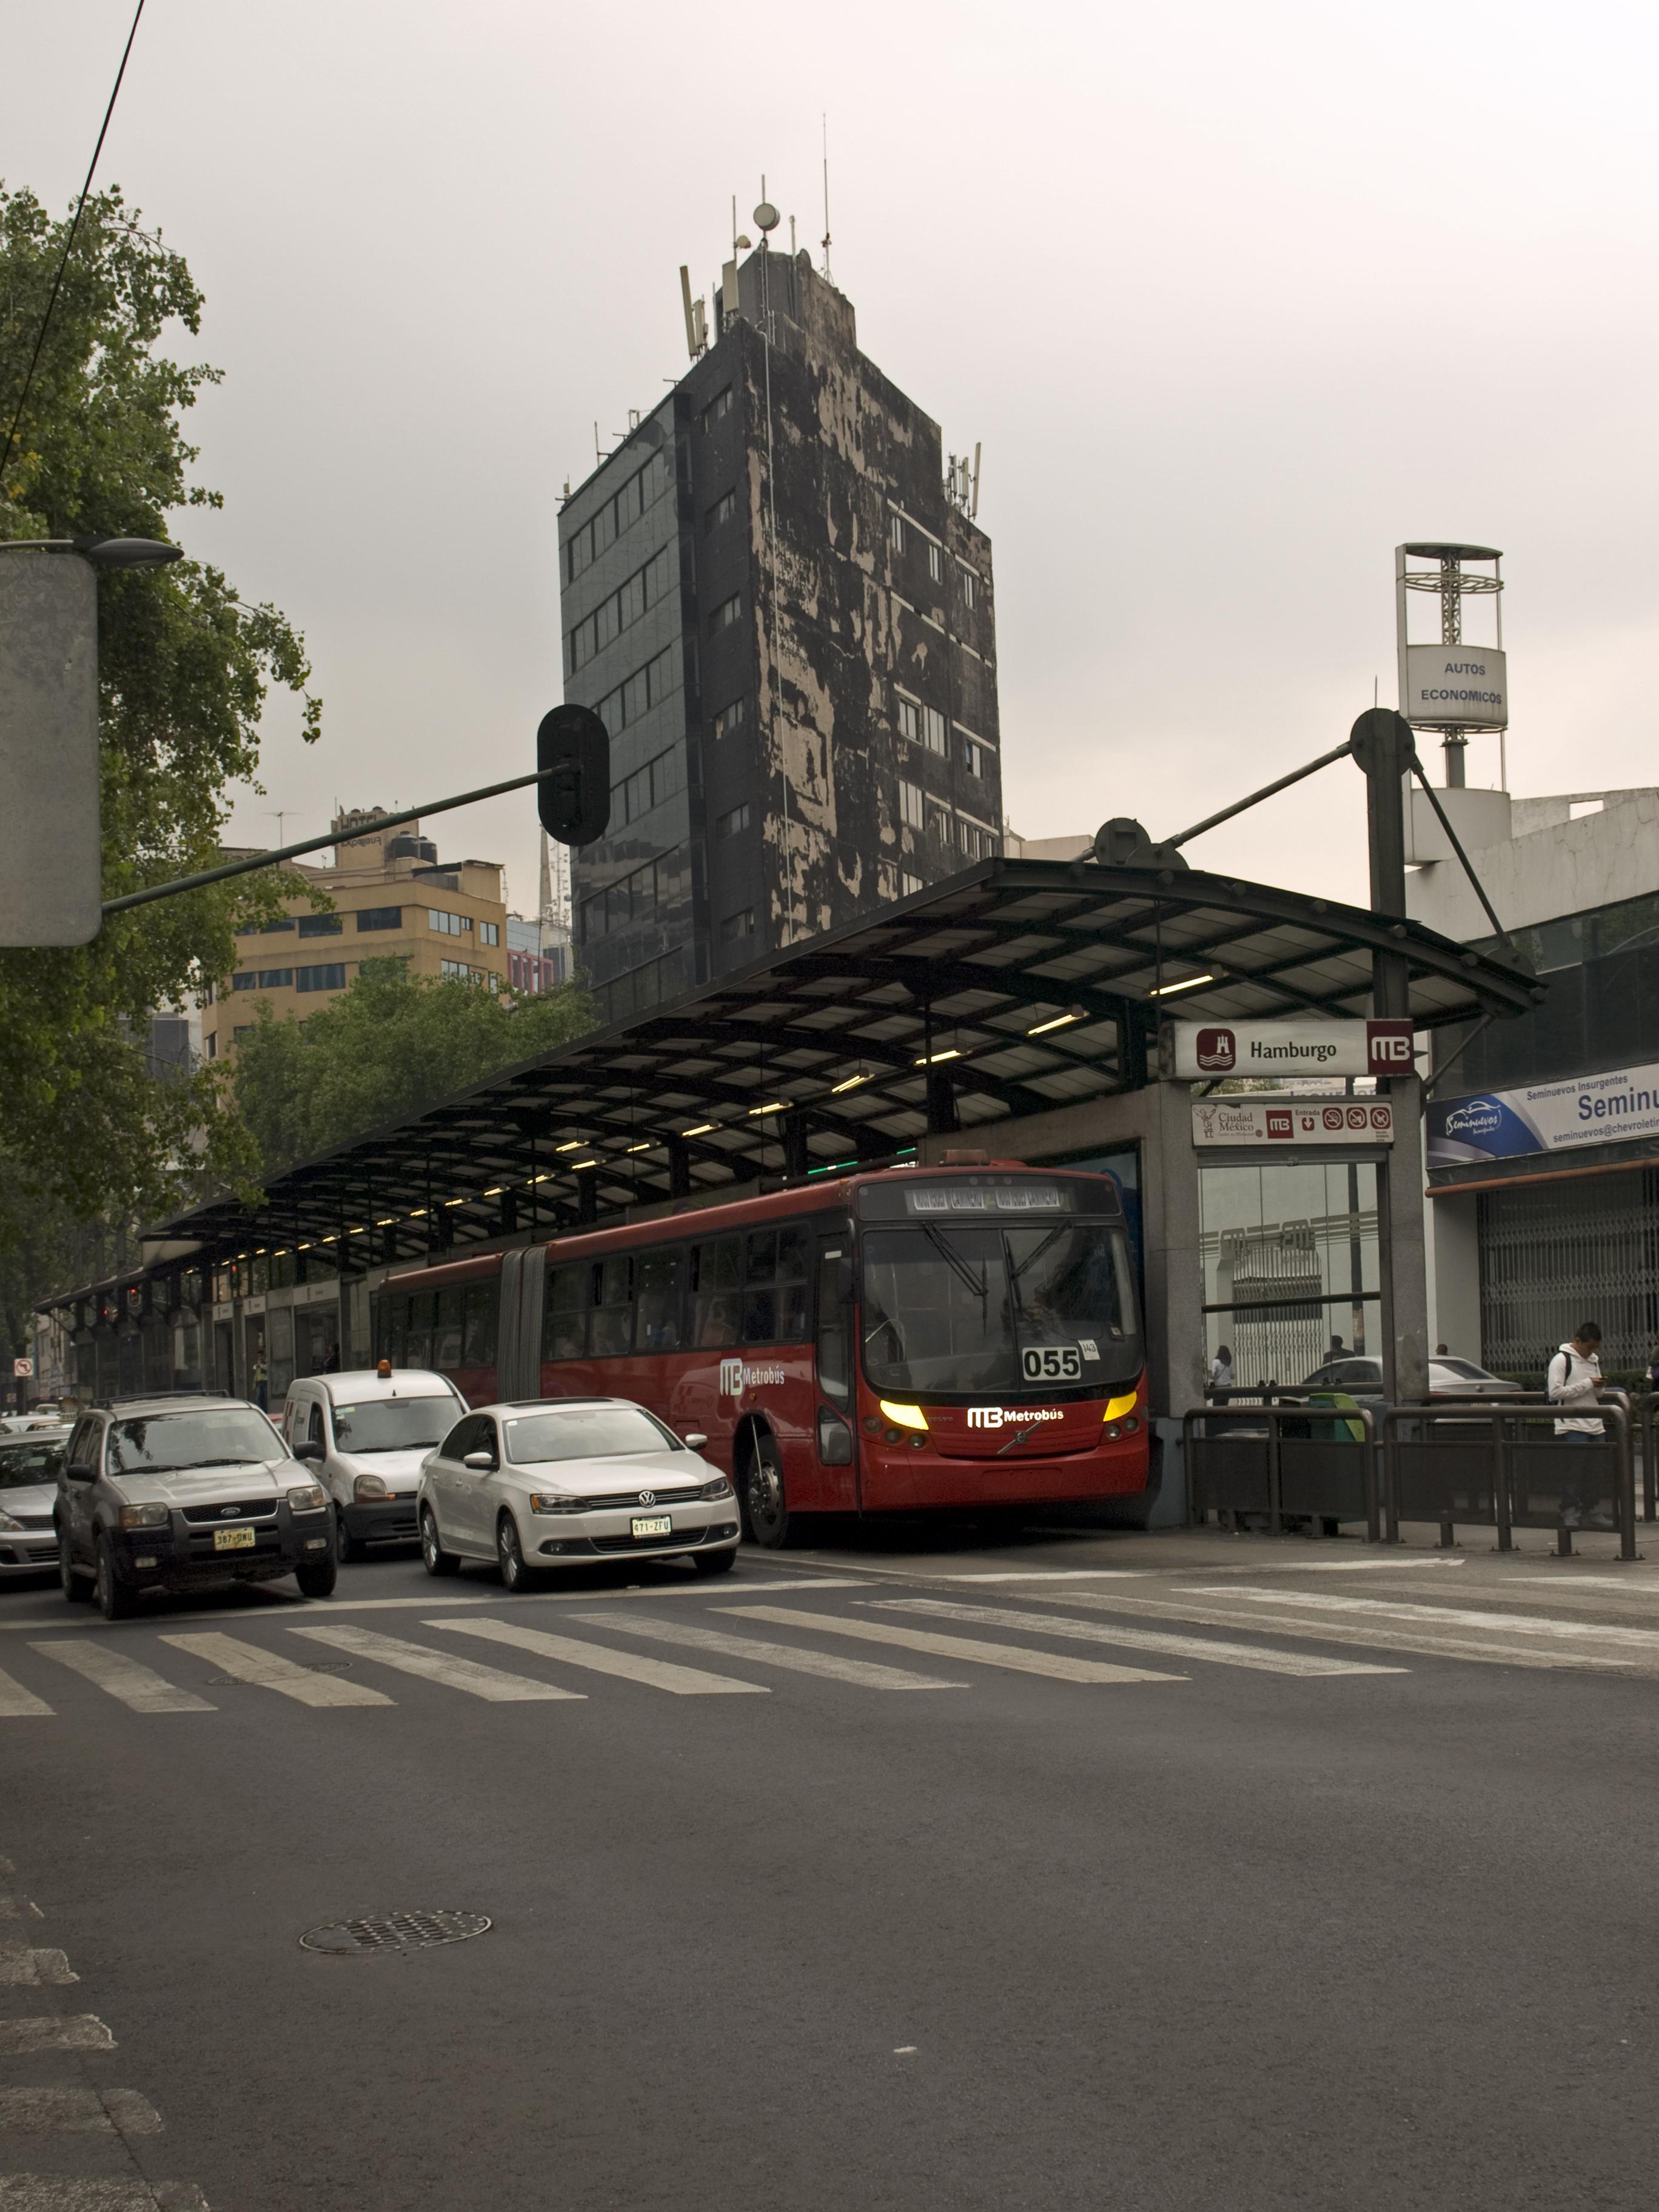 File:Mexico City Metrobus Hamburgo Station.jpg